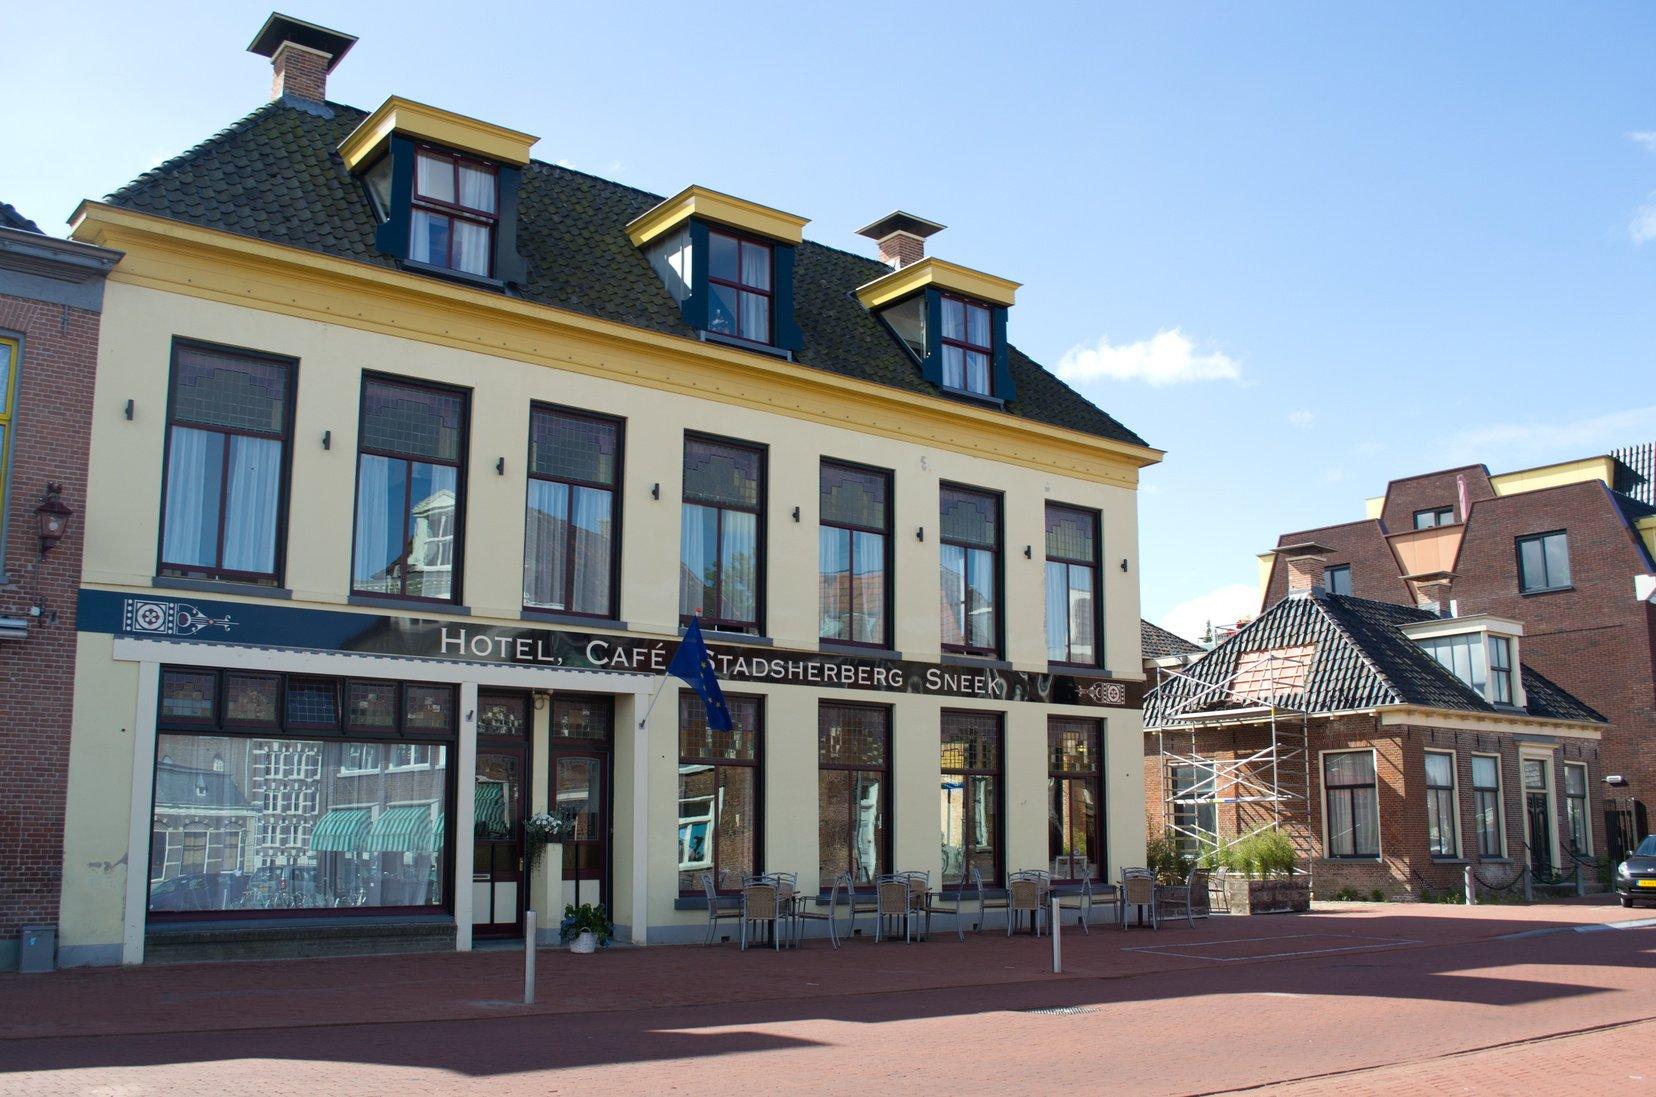 Sneek Hotel de Stadsherberg